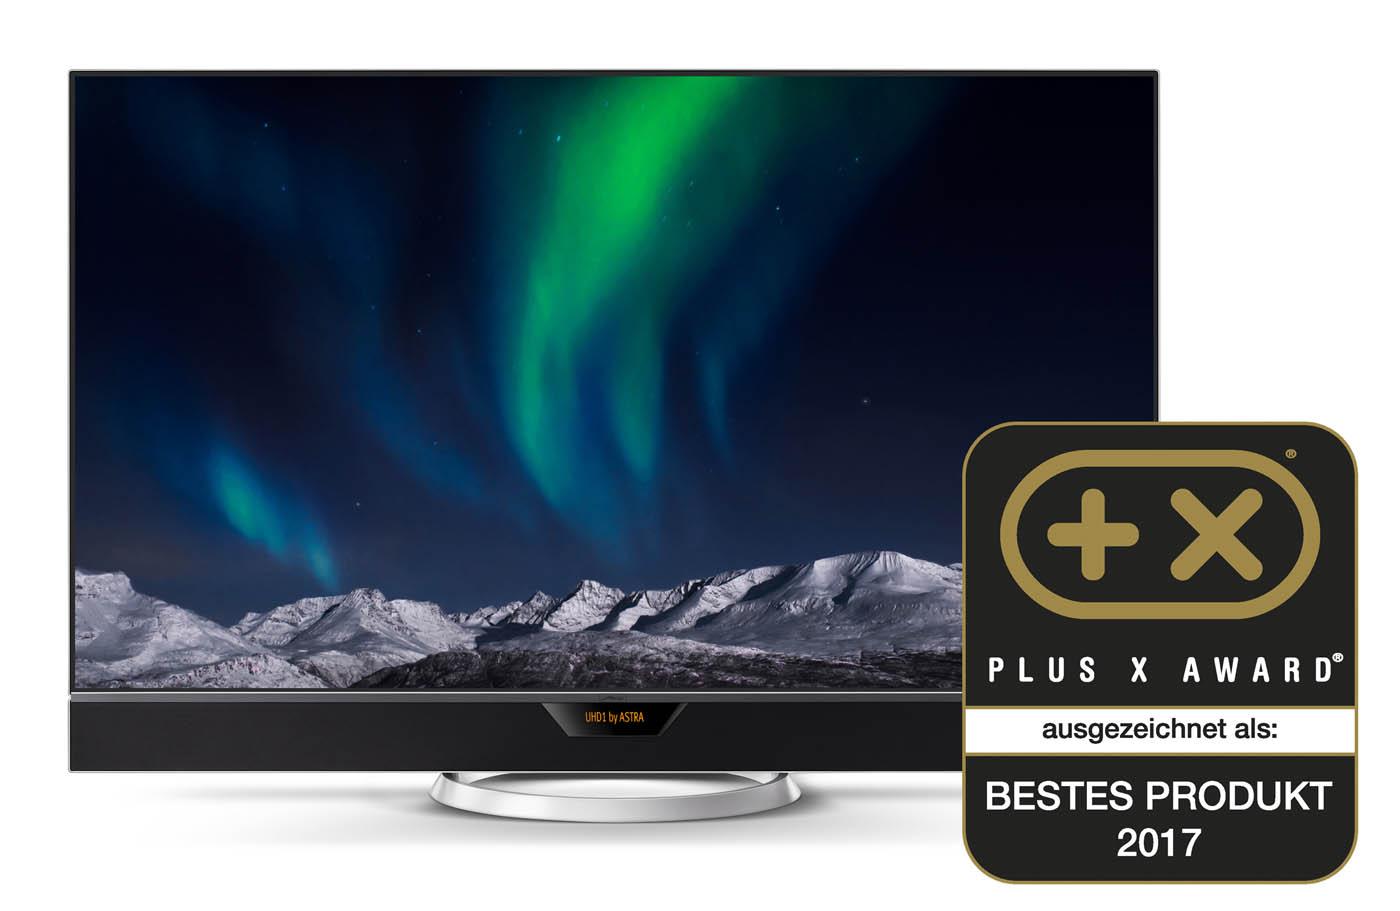 Plus X Award: Metz Novum bester OLED-TV 2017